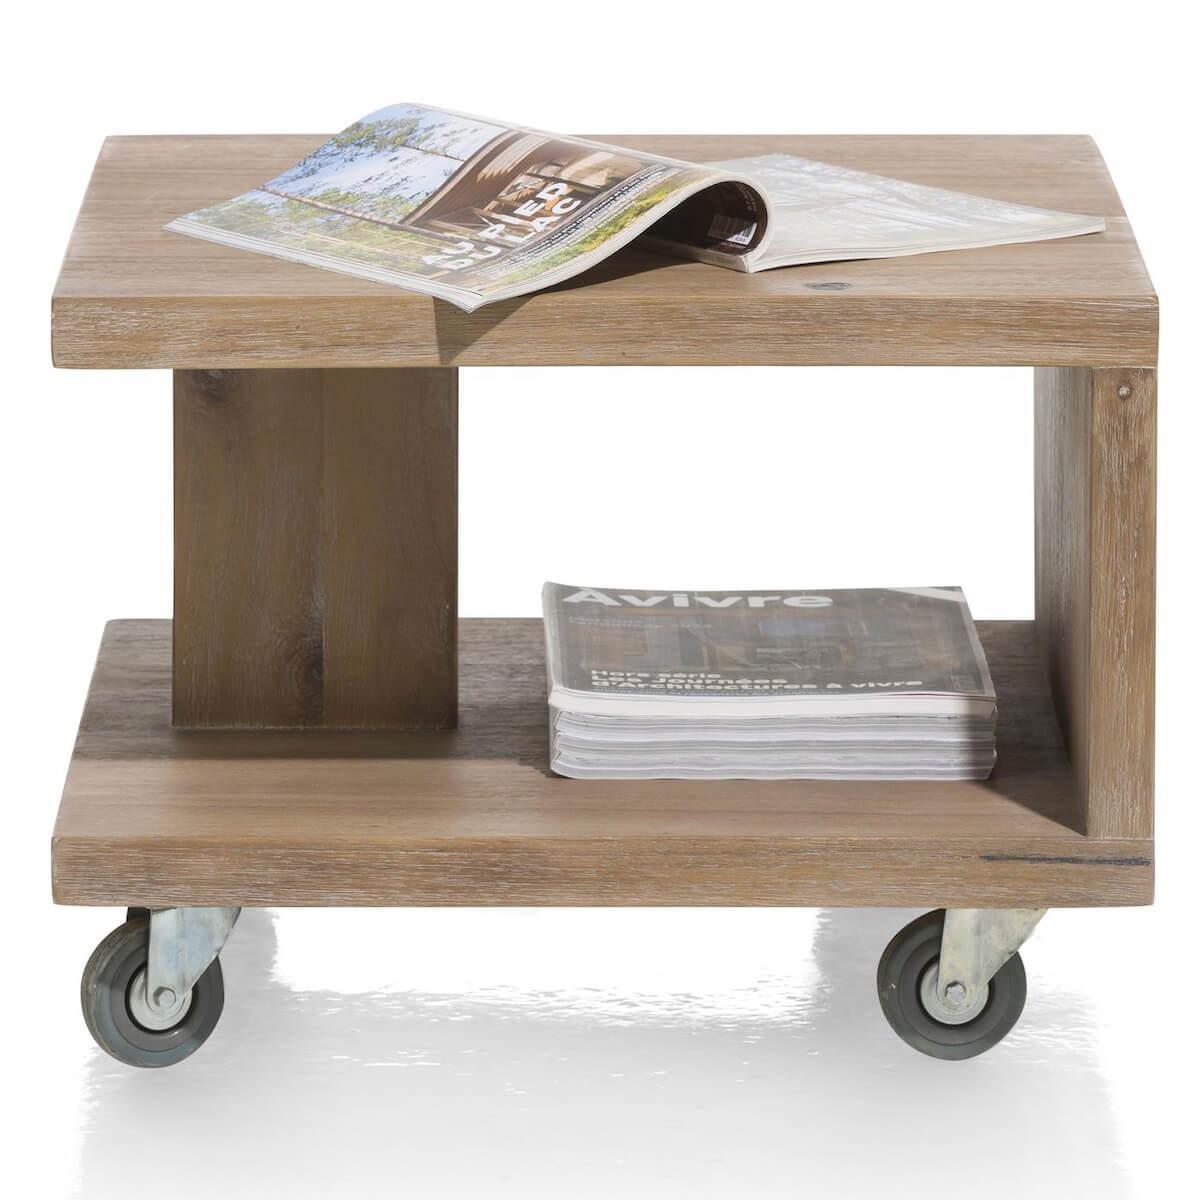 Table d'appoint BOX Henders & Hazel Tramwood vintage grey